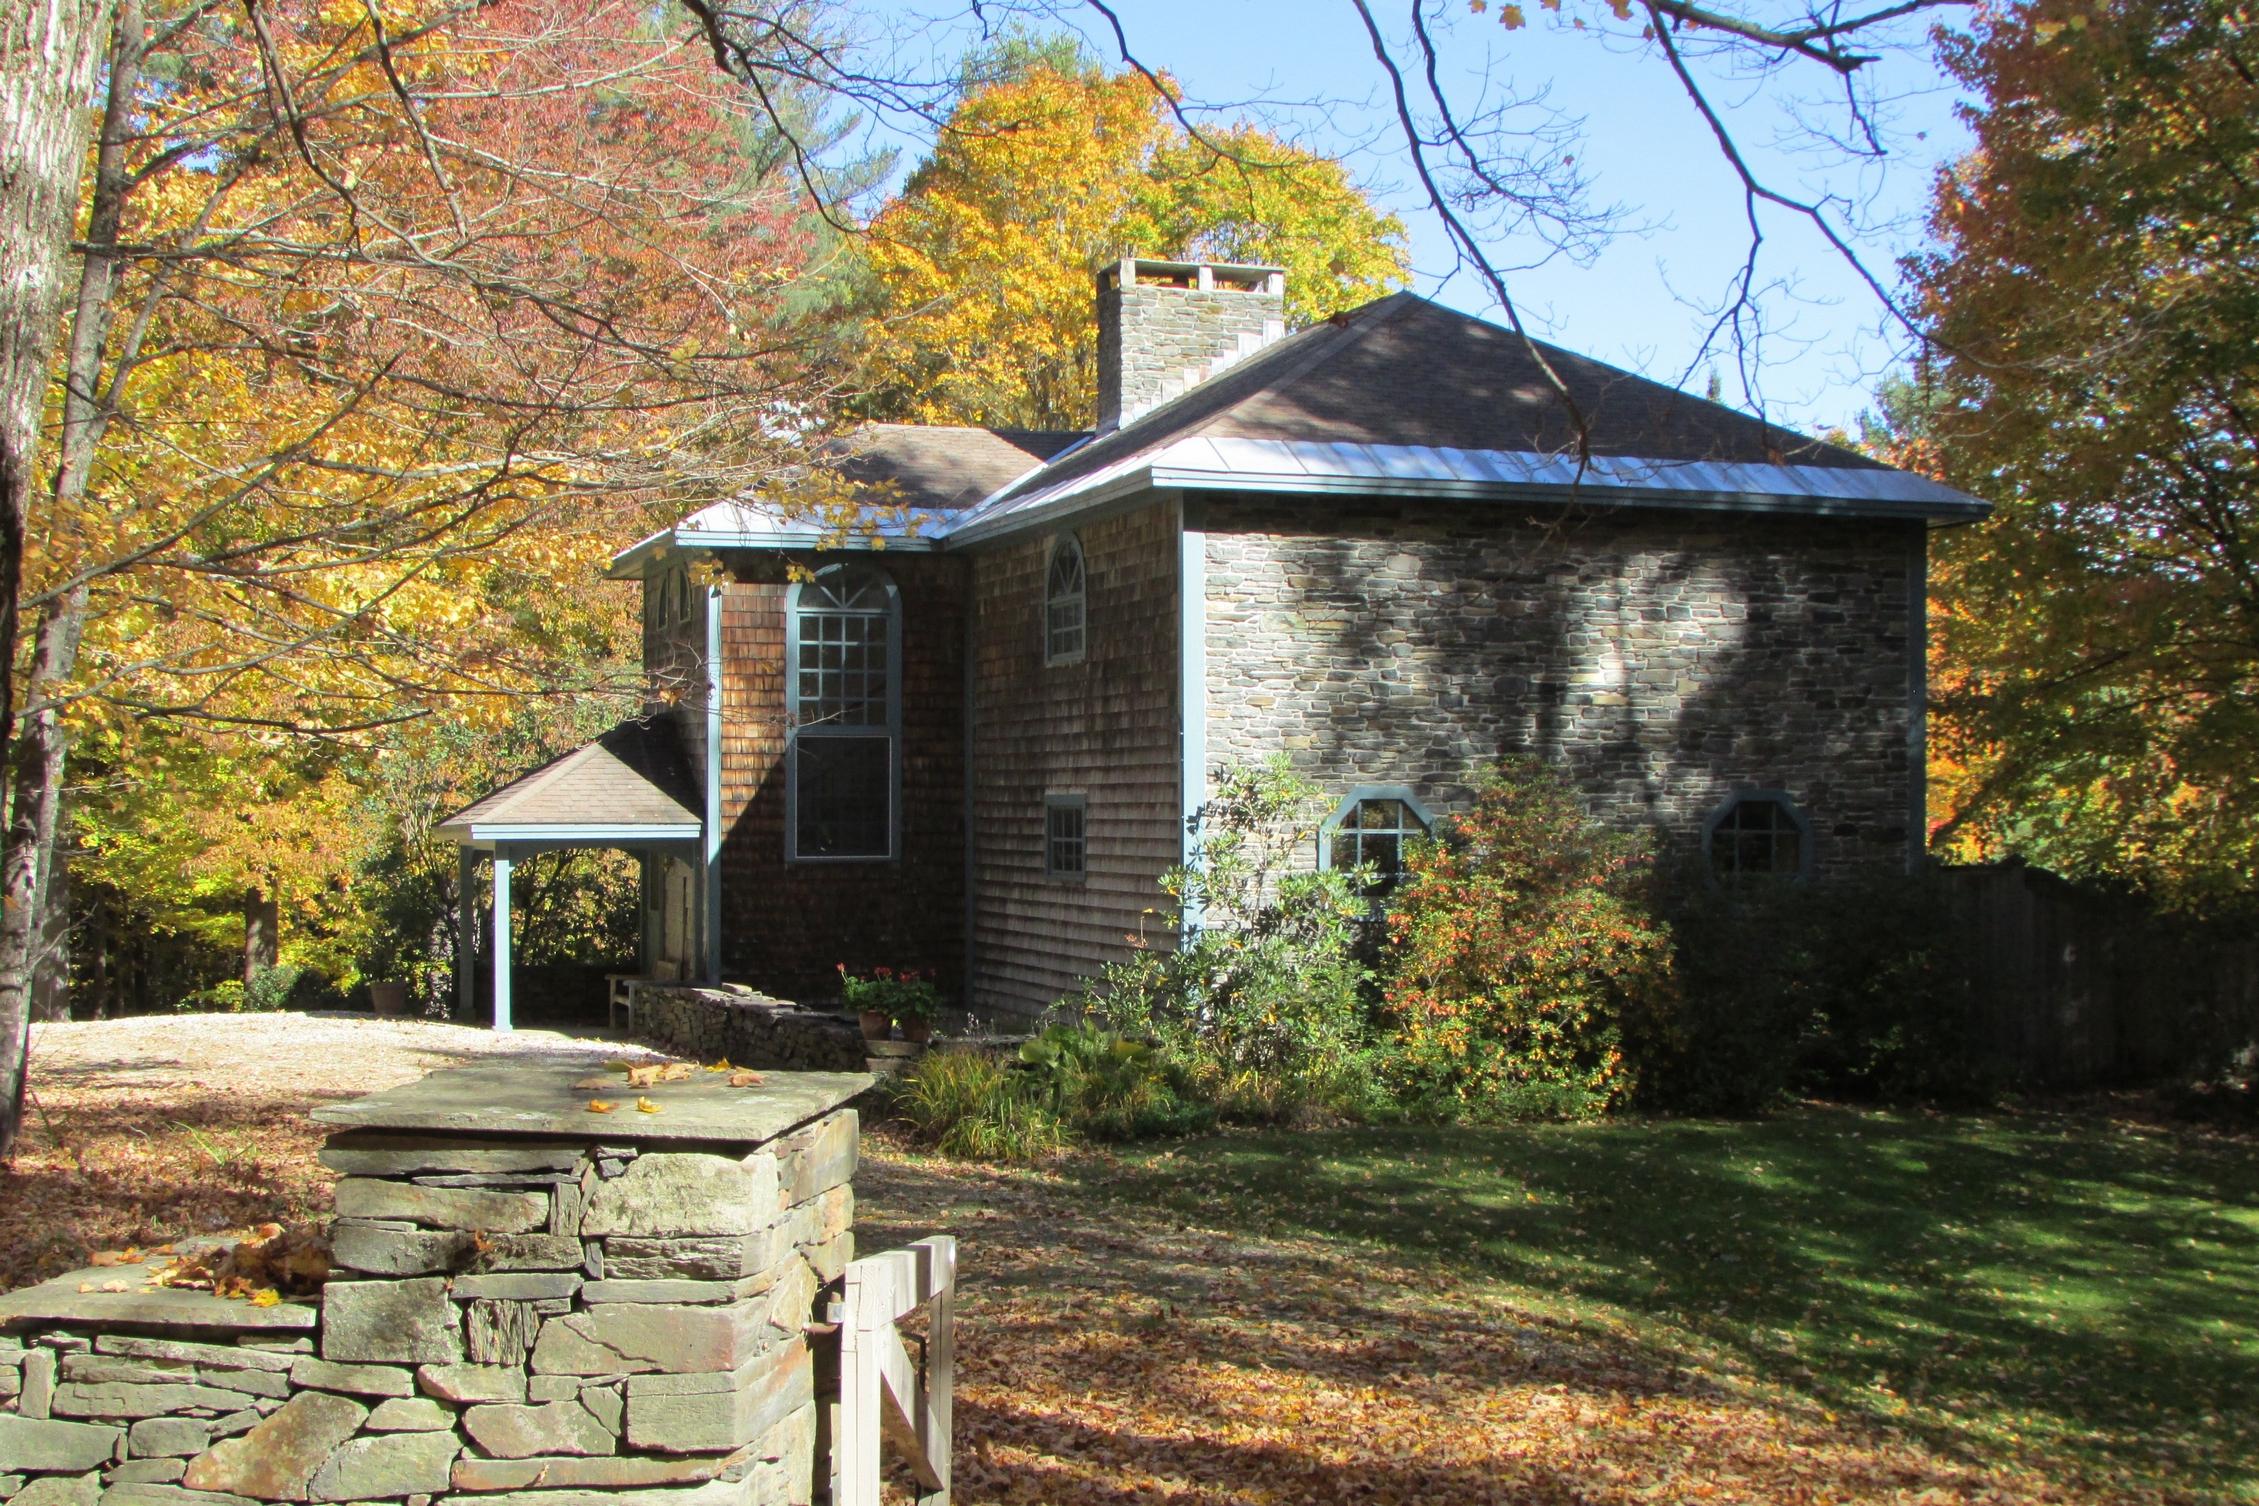 Moradia para Venda às Impressive Country Retreat 1264 Hanson Rd Halifax, Vermont, 05358 Estados Unidos